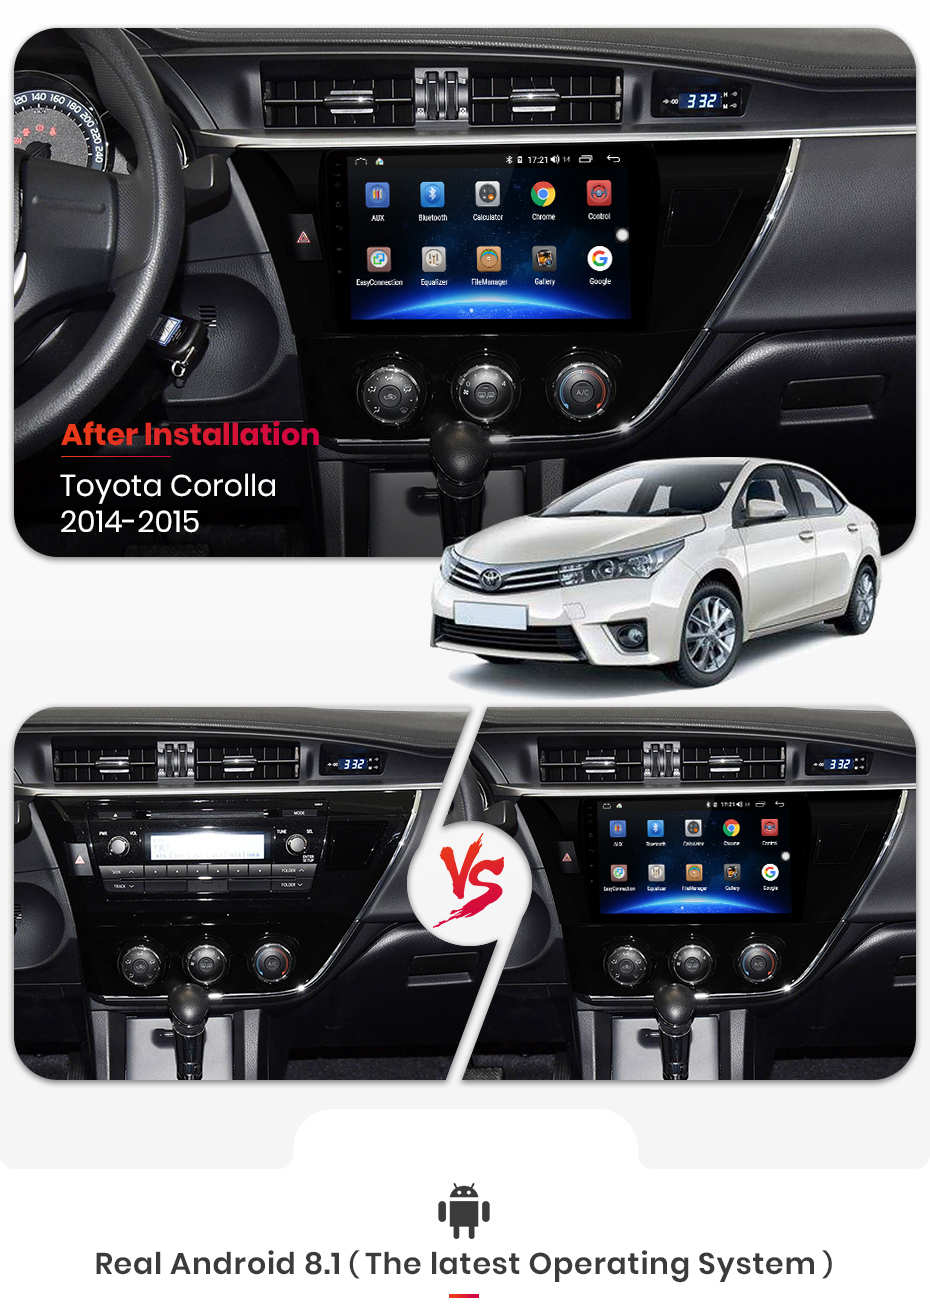 Toyota-Corolla_03